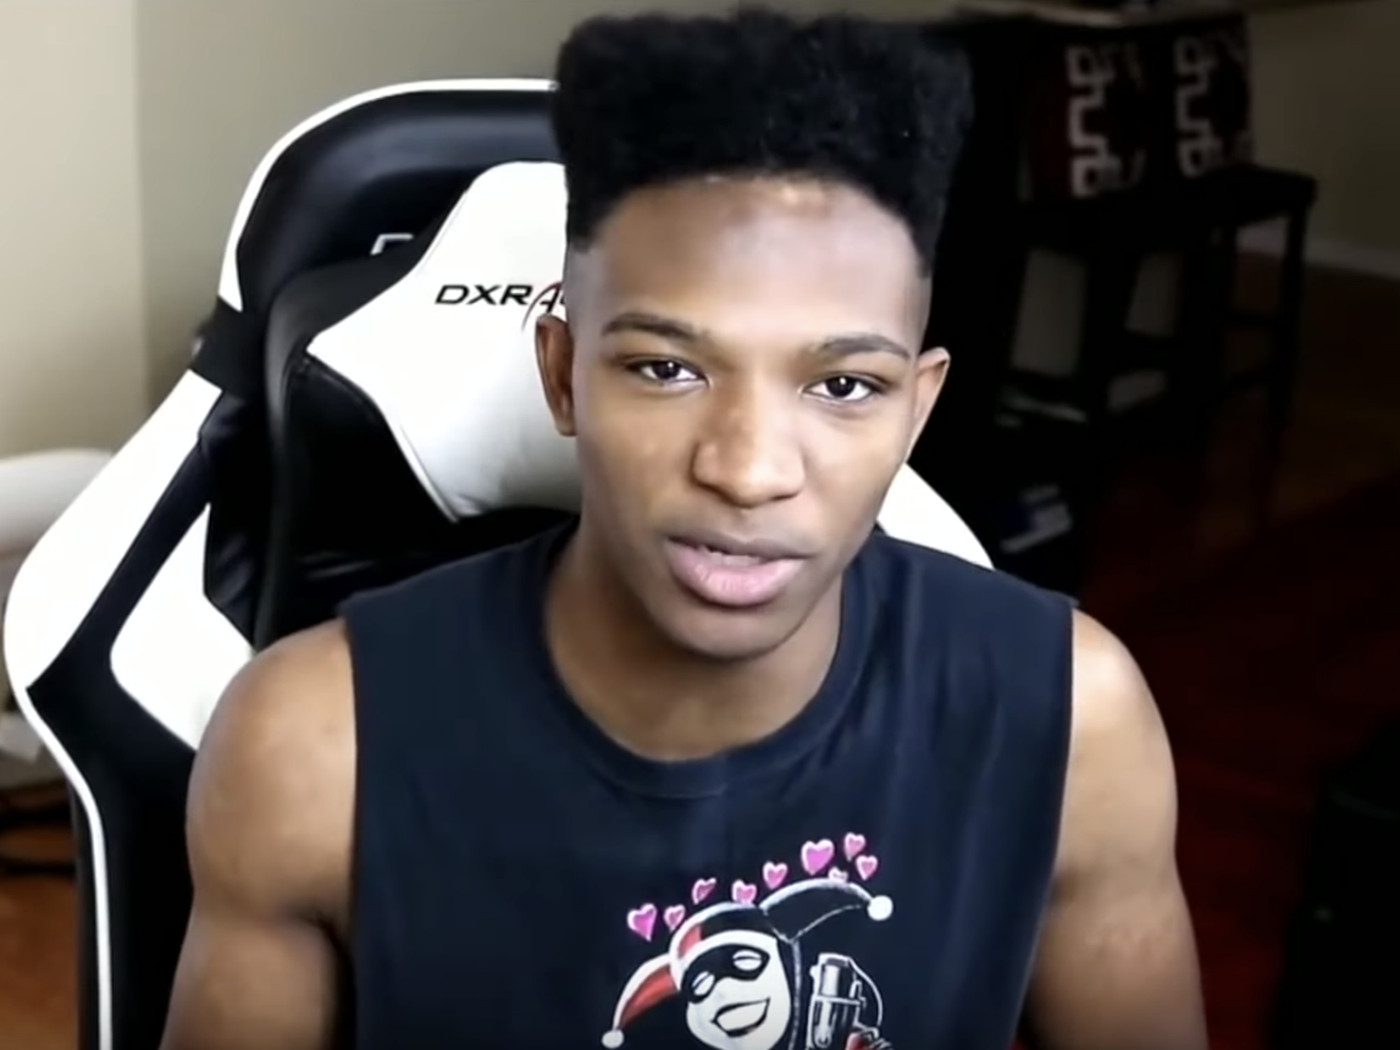 Roblox Got Talent Death Run Roblox Image Generator - Popular Youtuber Desmond Etika Amofah Found Dead The Verge